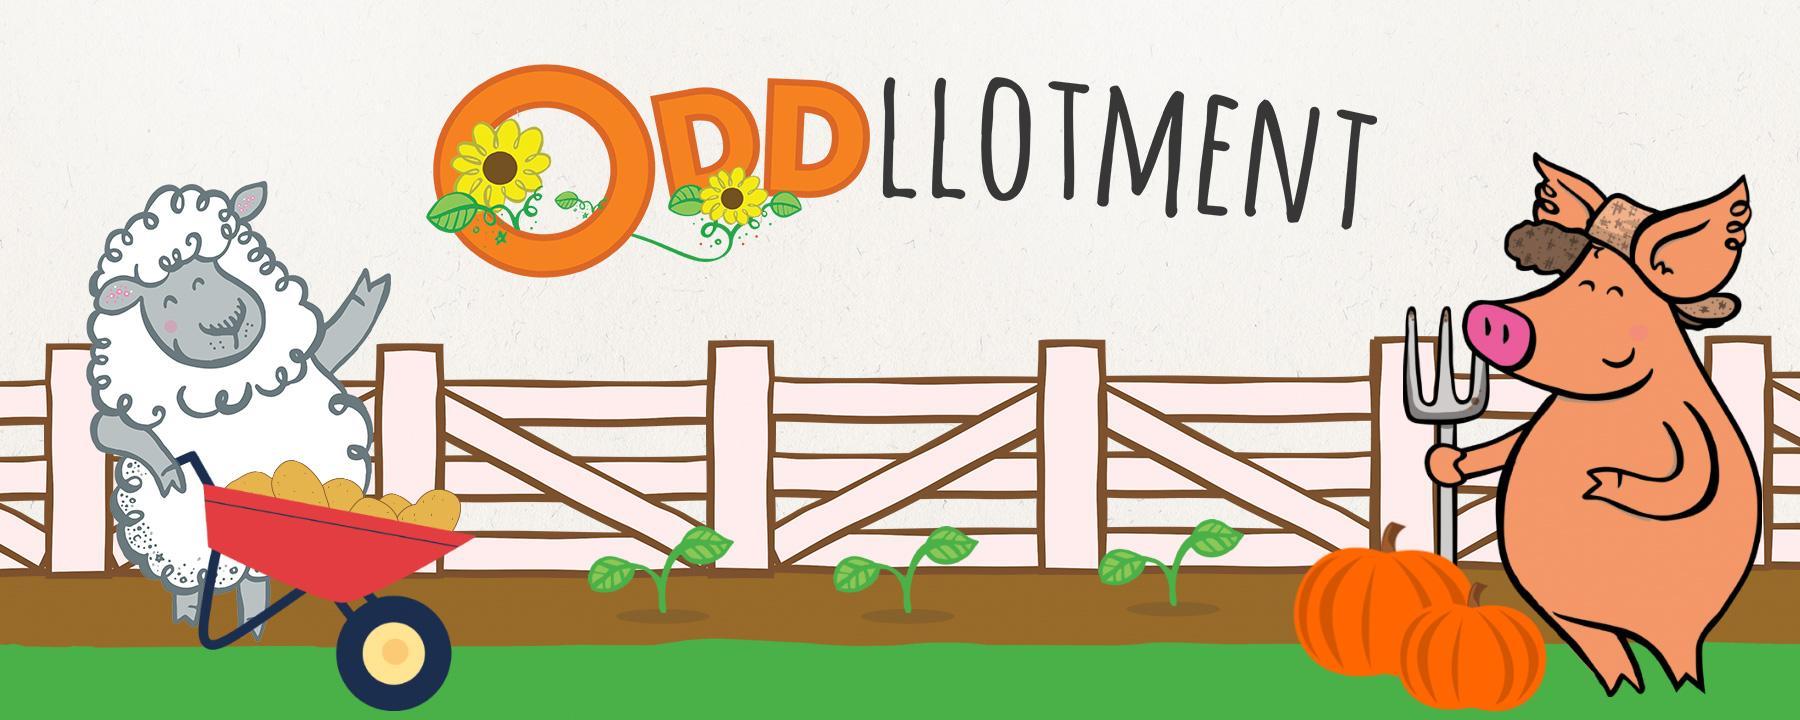 the oddllotment at odds farm park